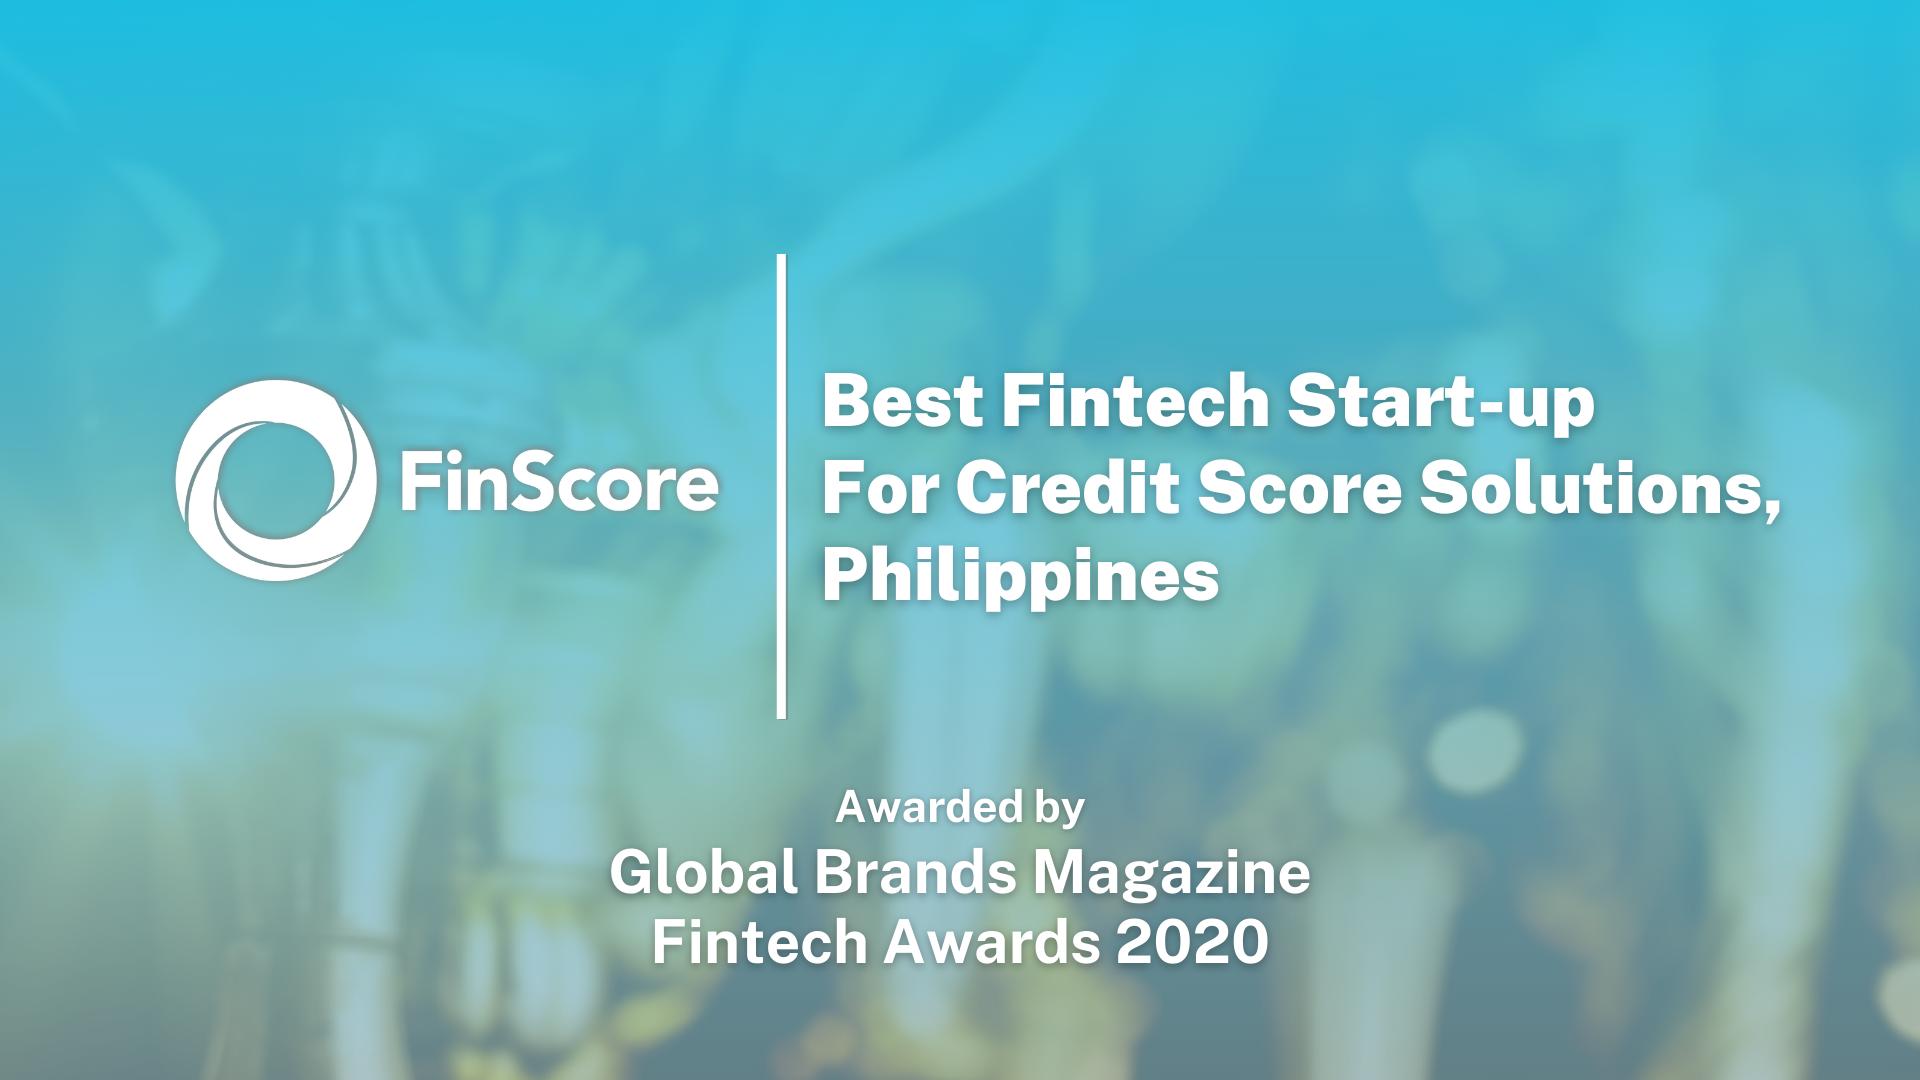 Global Brands Magazine Awards FinScore as Best Fintech Start-up for Credit Score Philippines